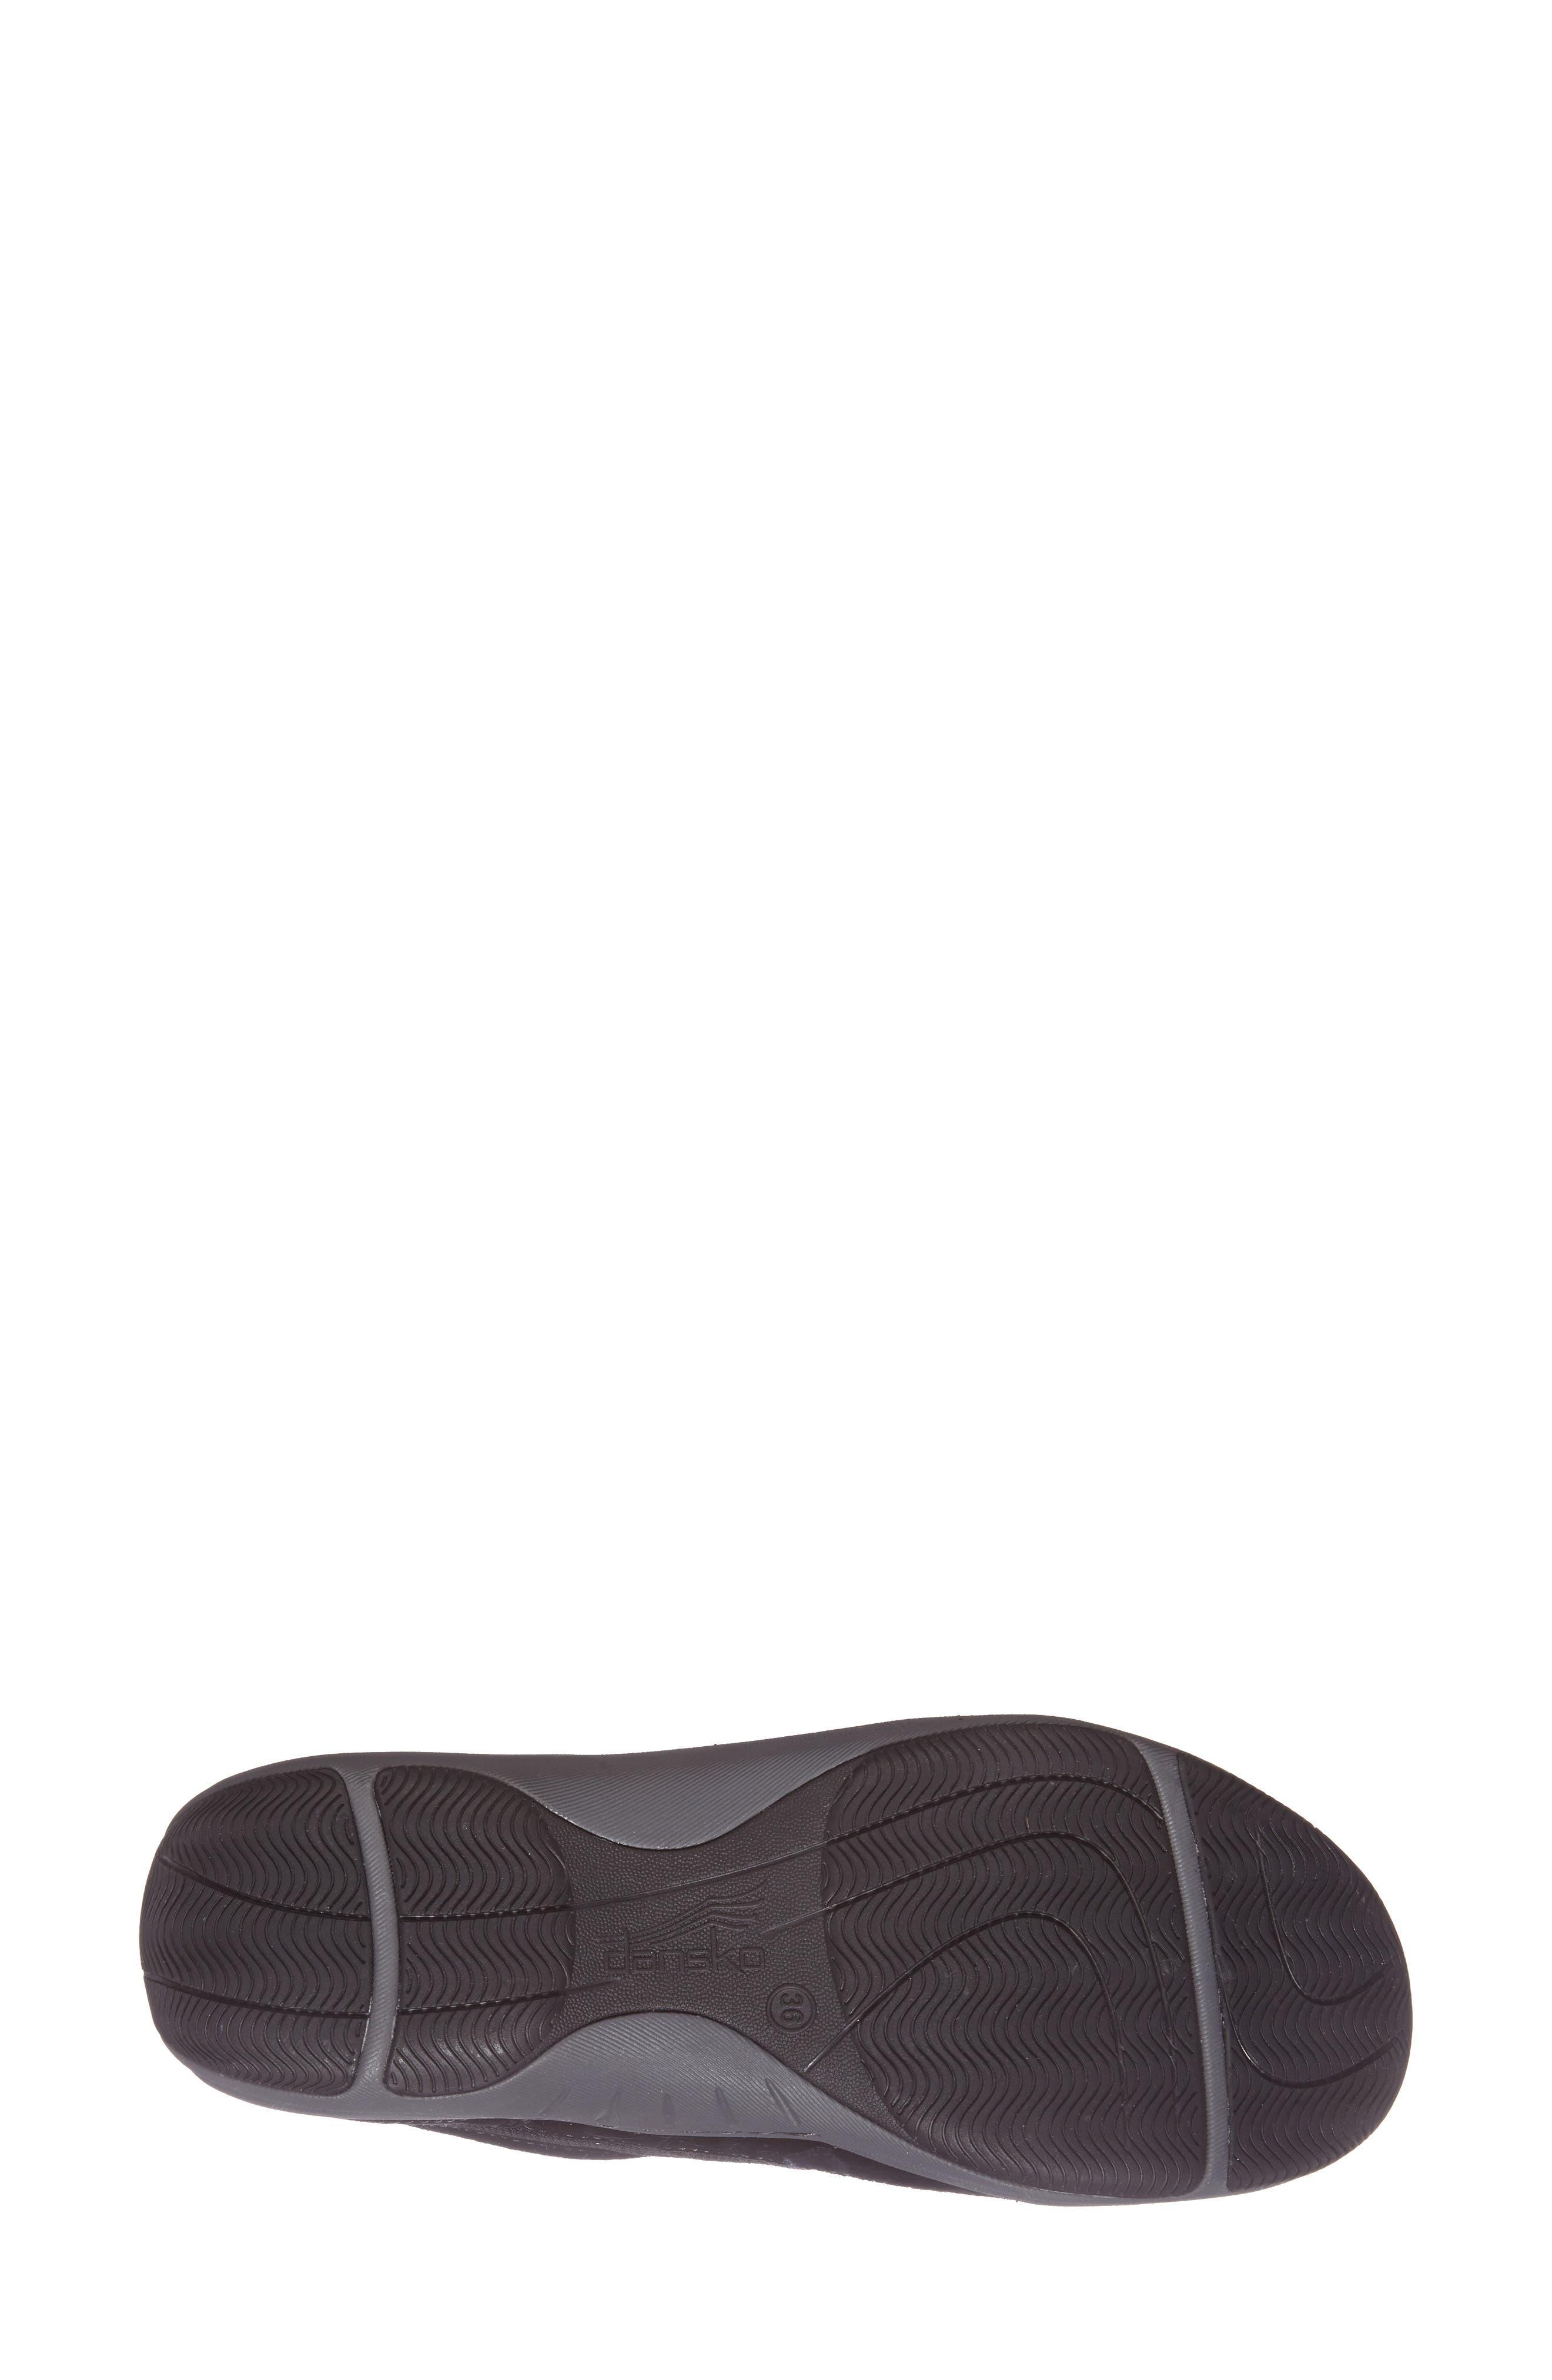 'Helen' Suede & Mesh Sneaker,                             Alternate thumbnail 16, color,